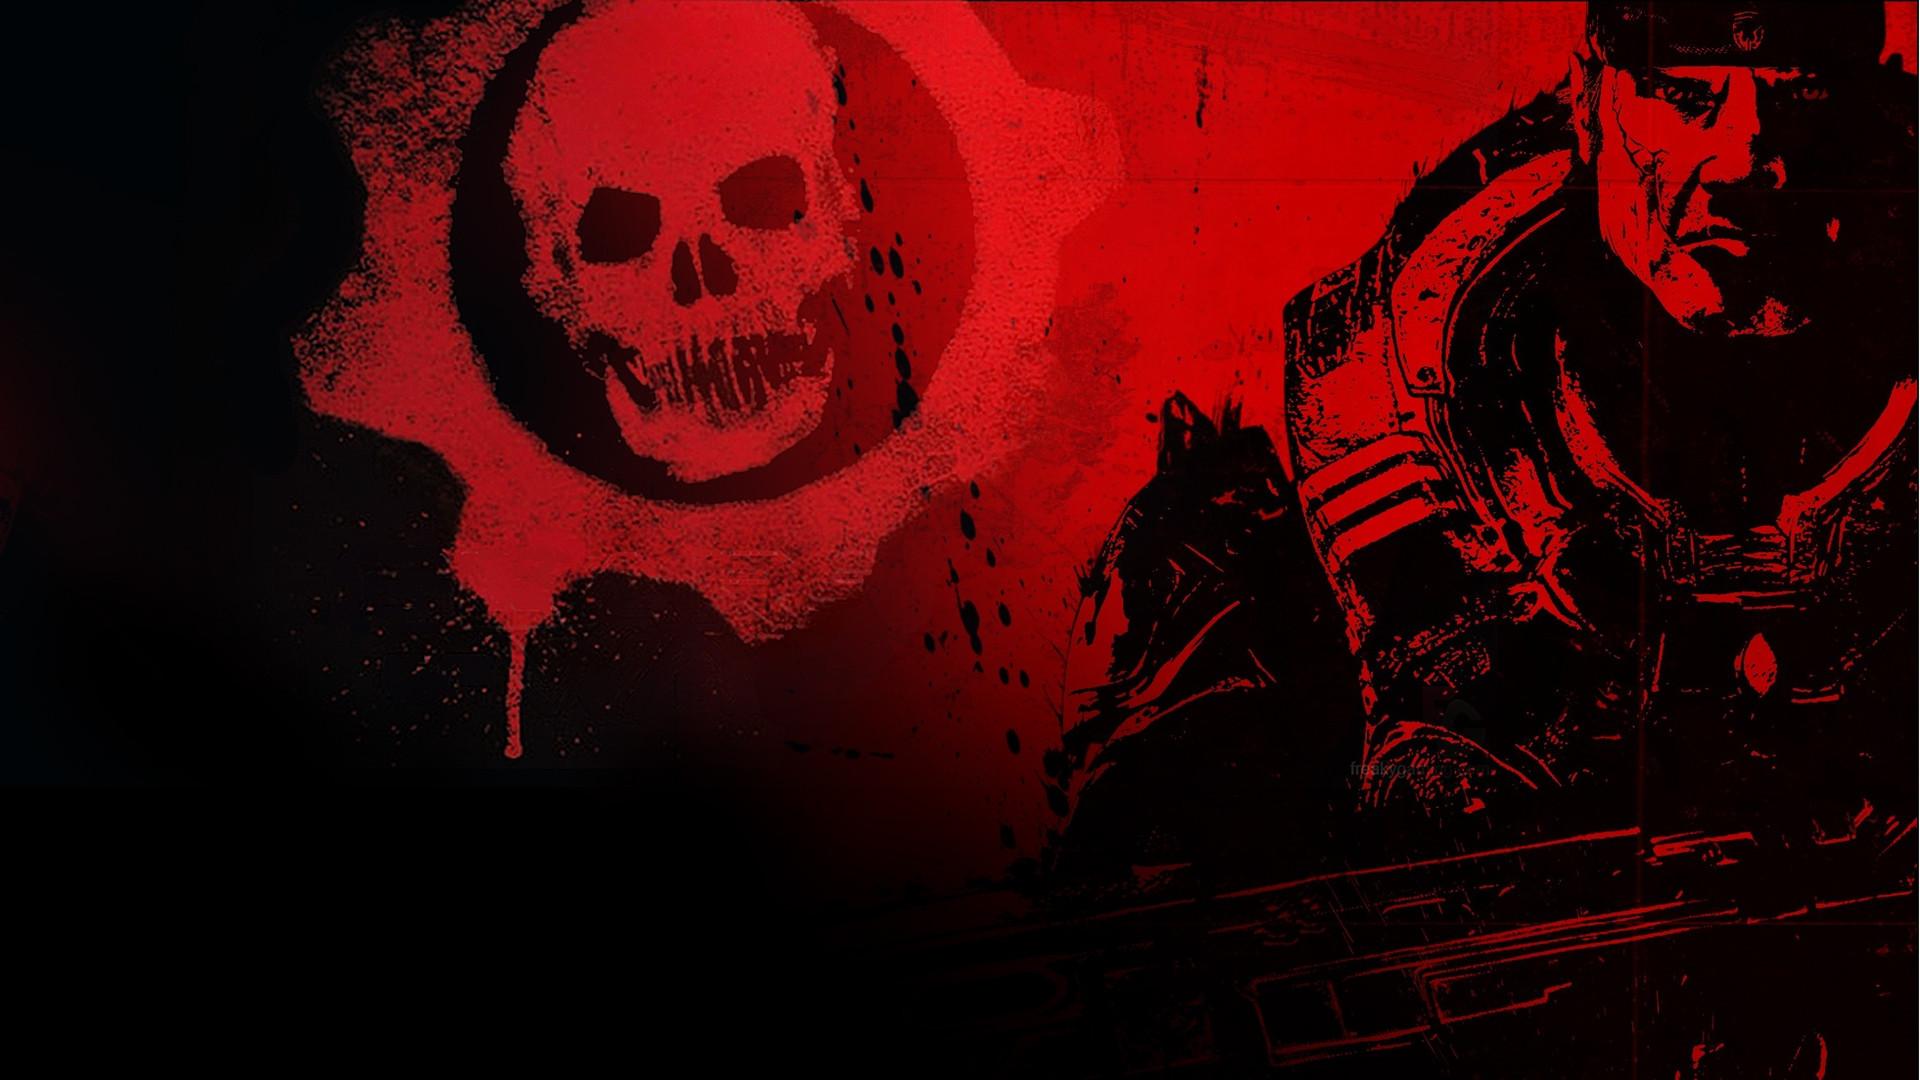 Gears Of War Hd Wallpaper 76 Images